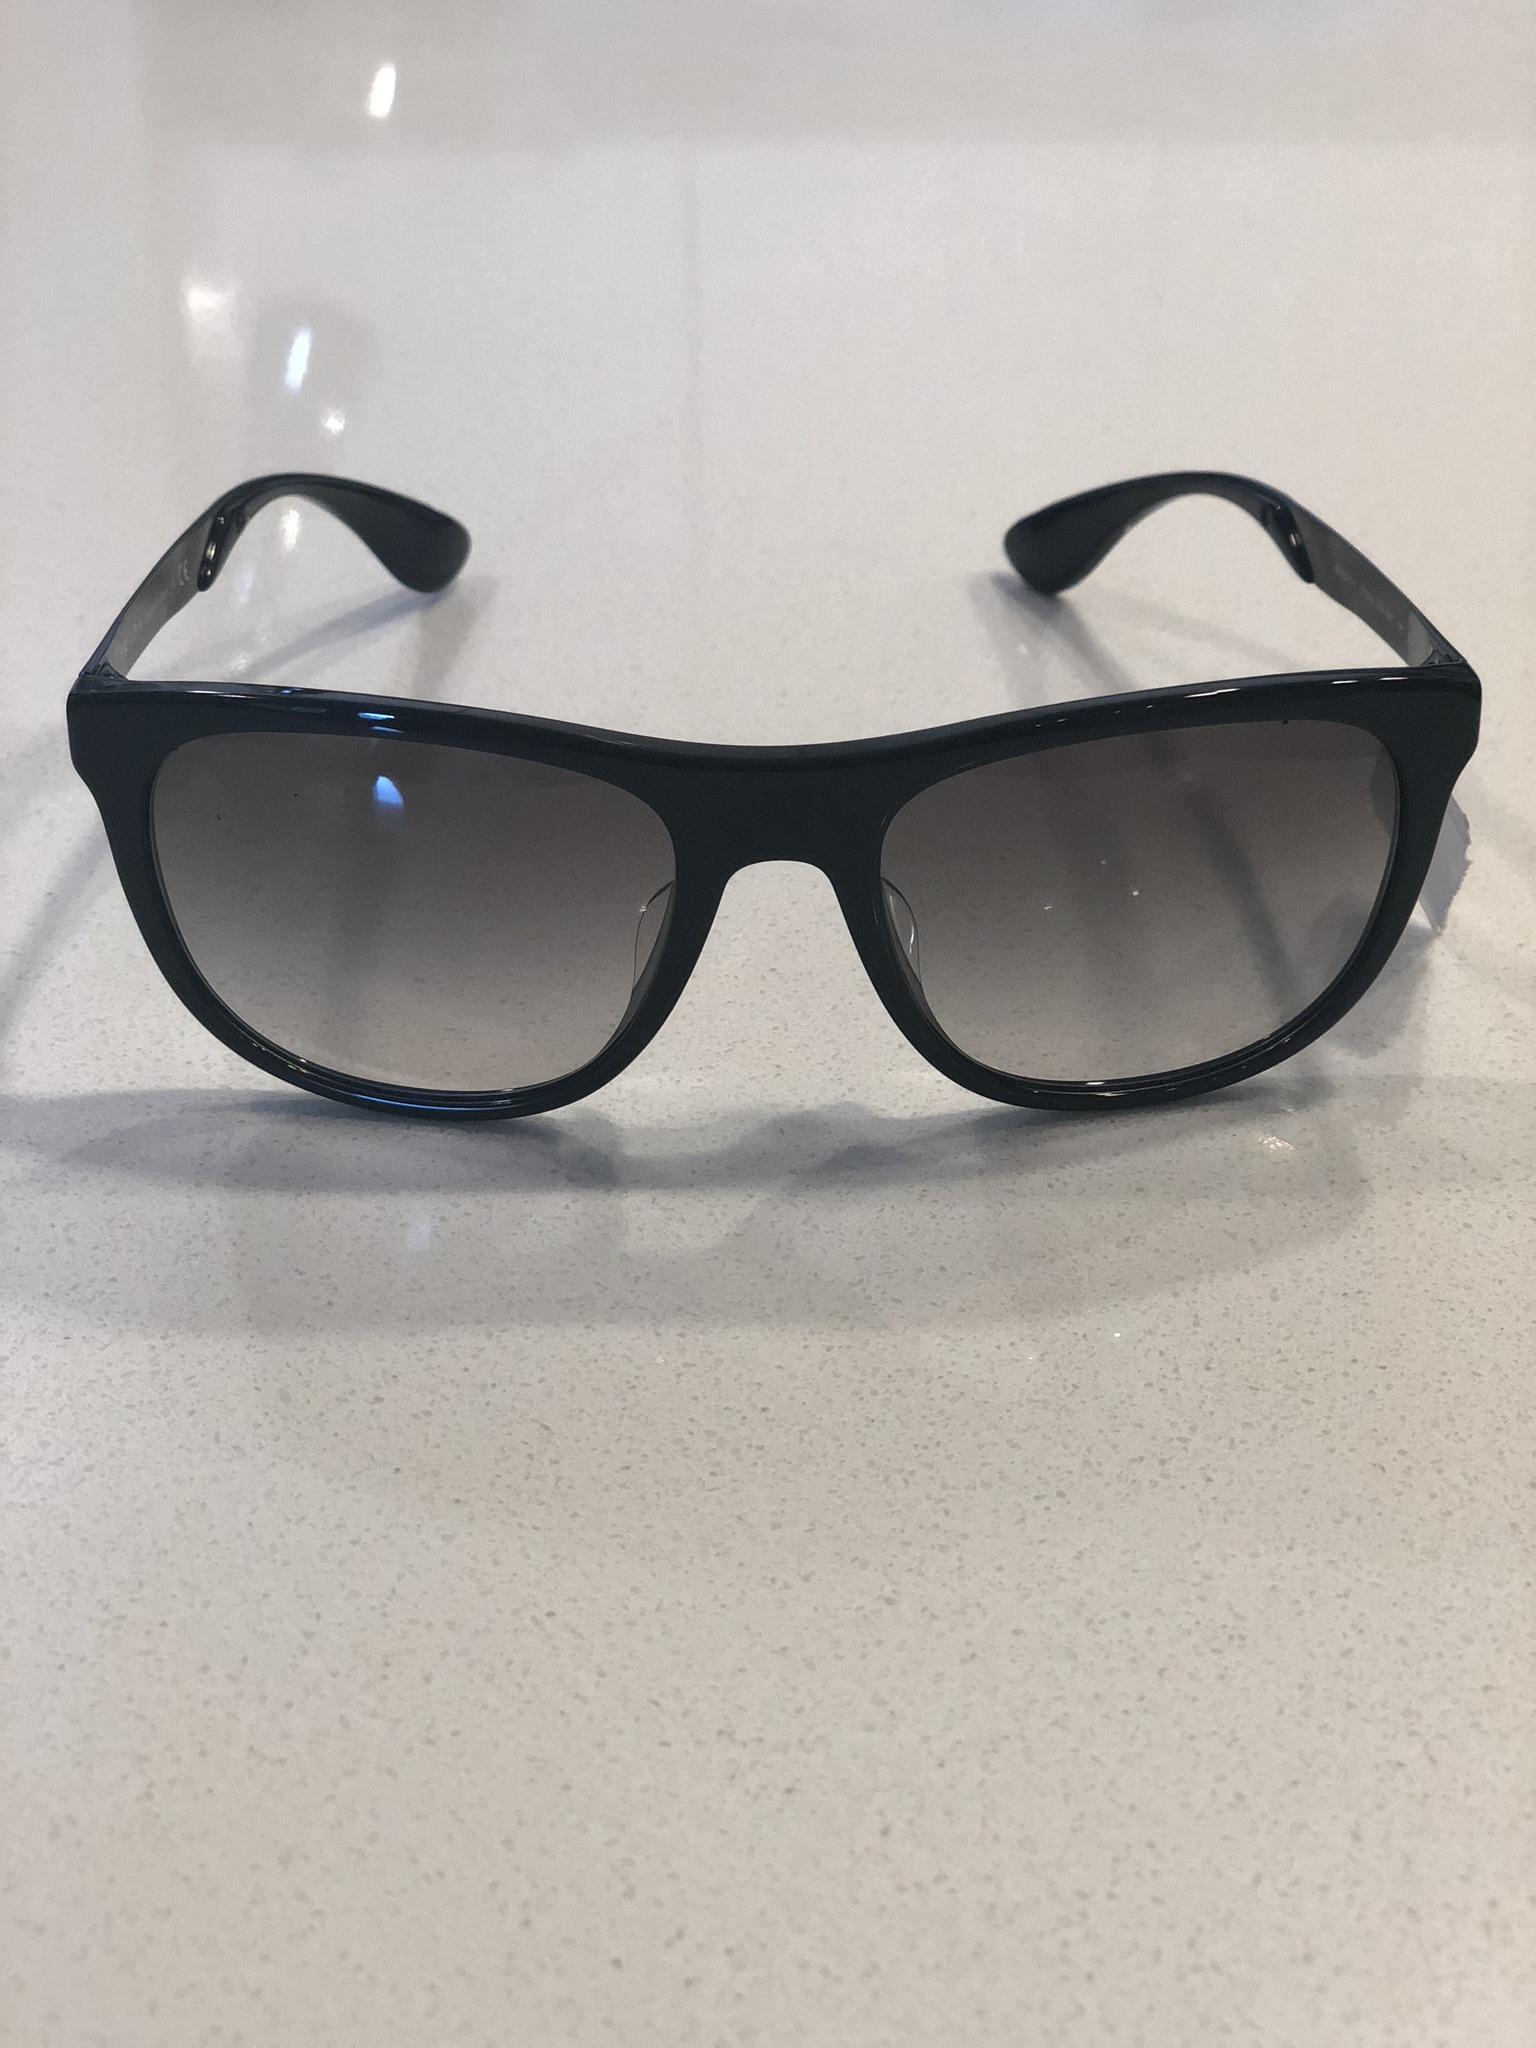 ed042bb613c1 Prada Prada Sunglasses Black Gray Gradient Spr04s-f 1ab-0a7 57-19 ...